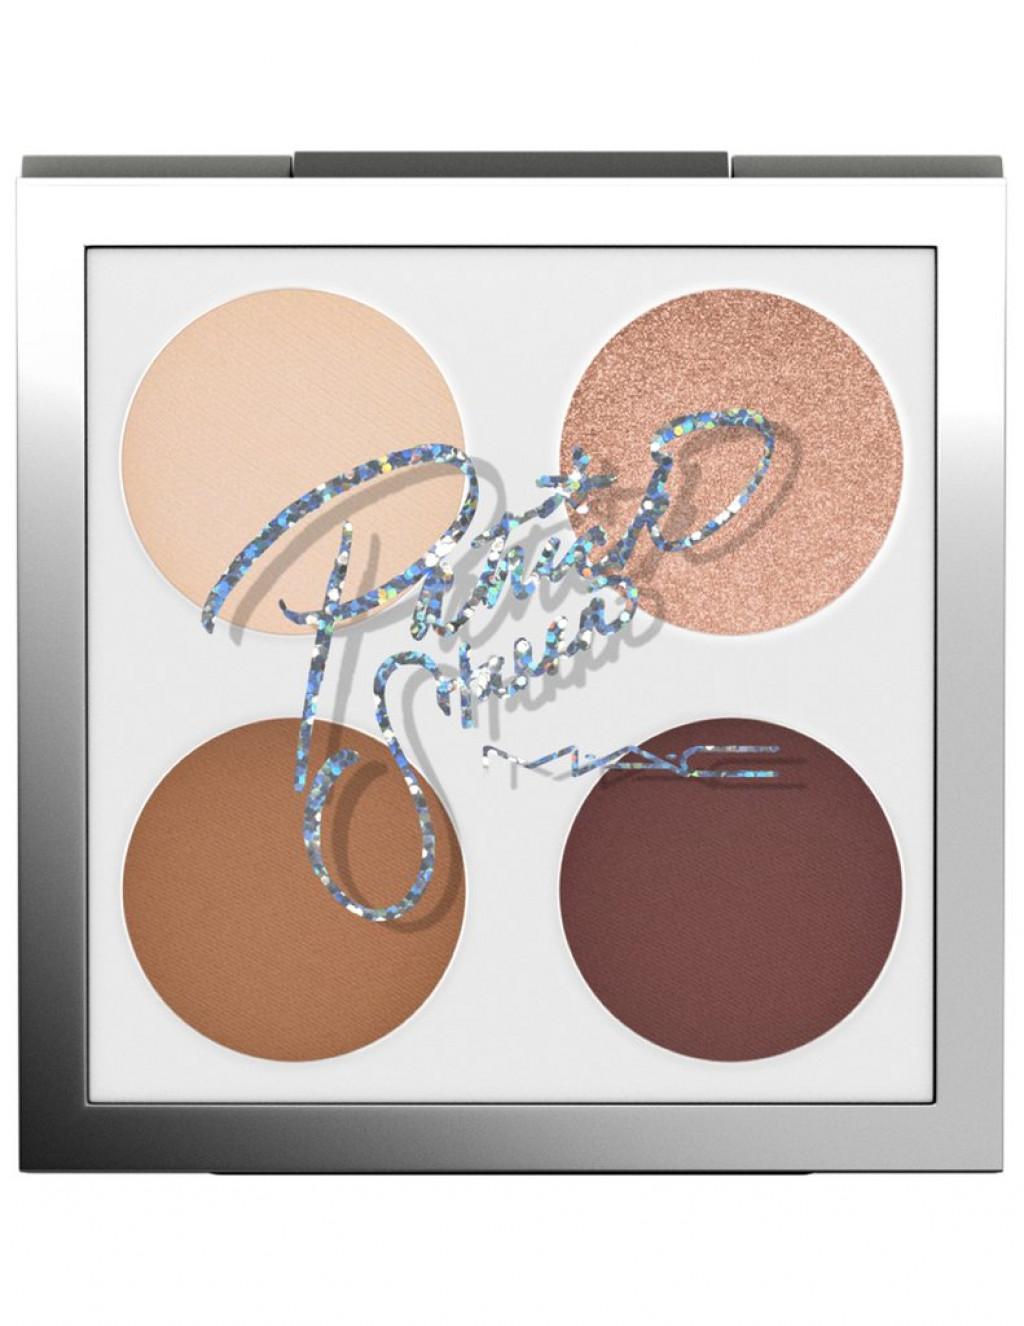 Patrick-Starrr-Eyeshadow-Quad-Palette